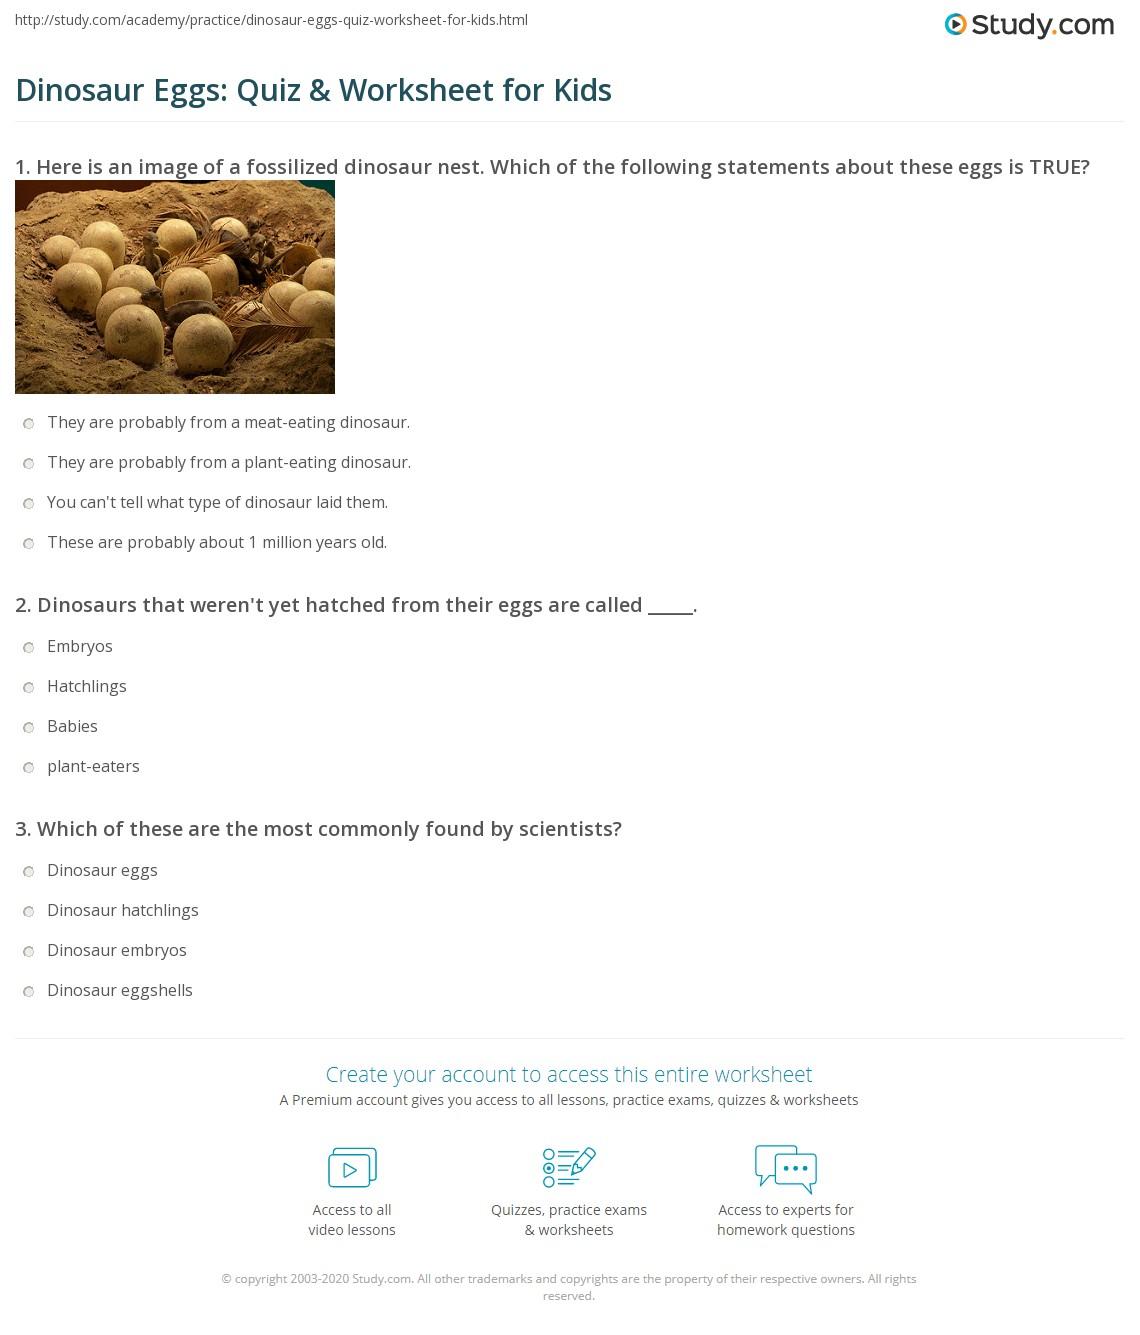 Dinosaur Eggs: Quiz & Worksheet for Kids | Study.com